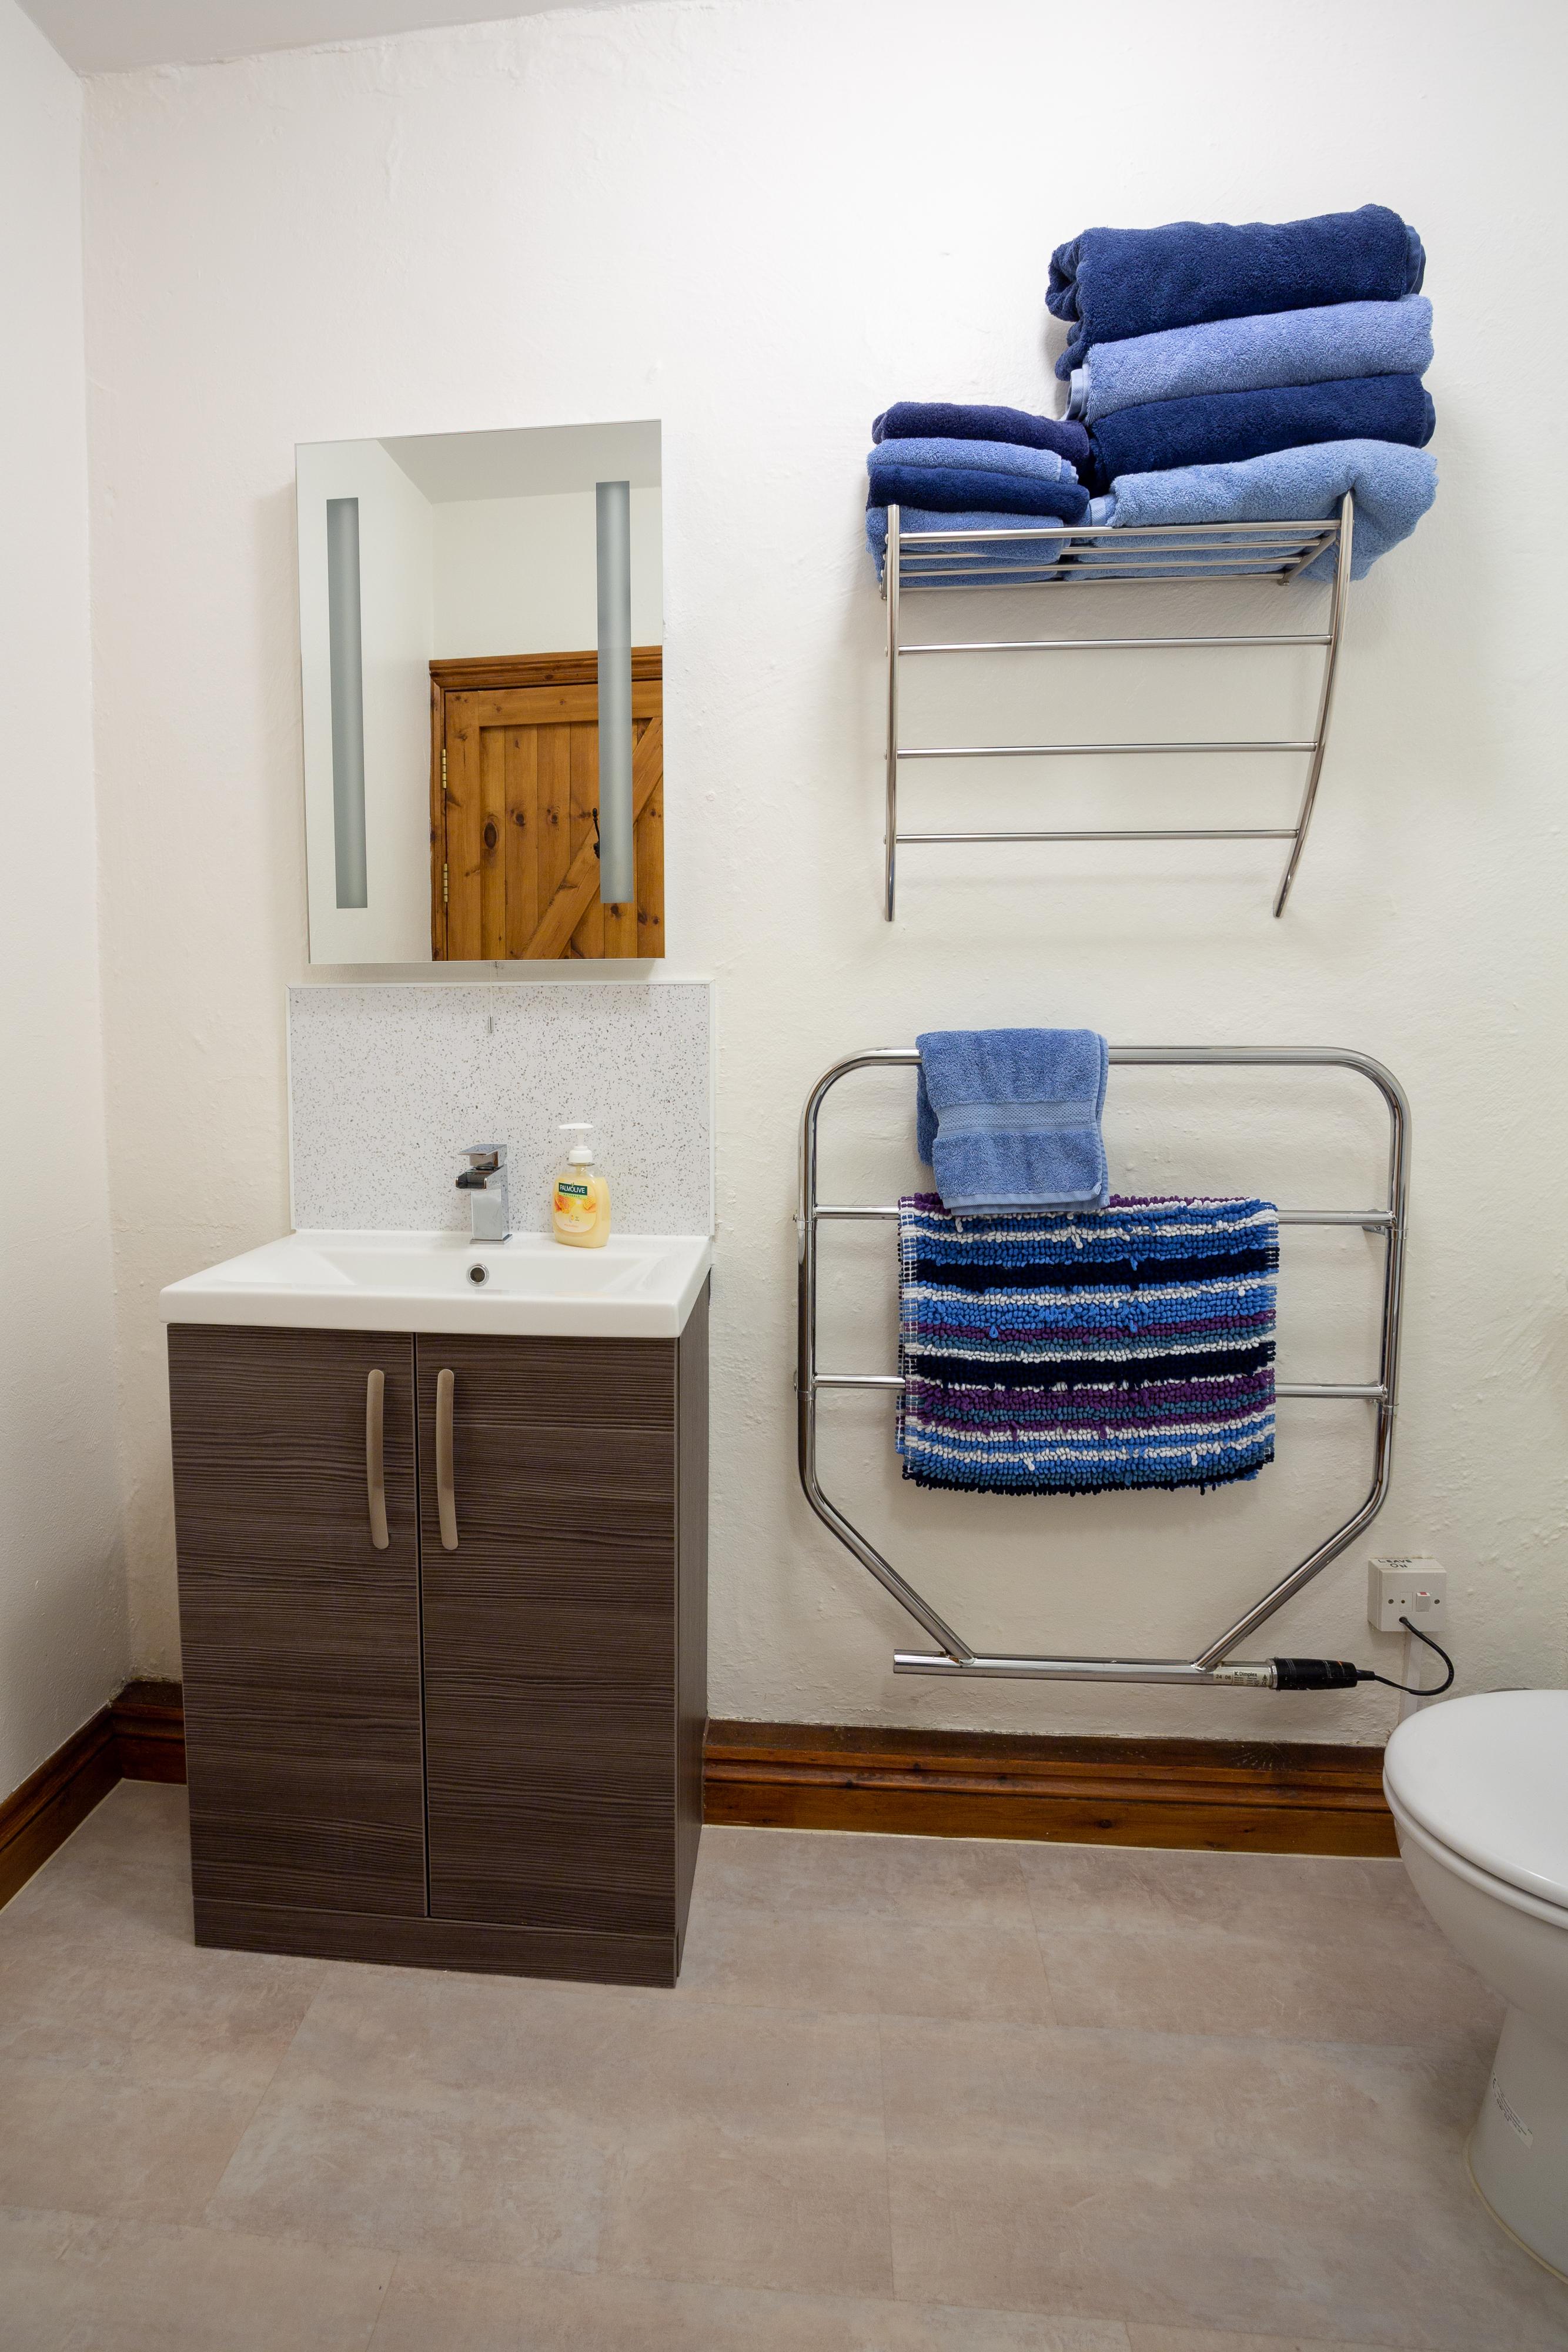 Newly refurbished bathrooms